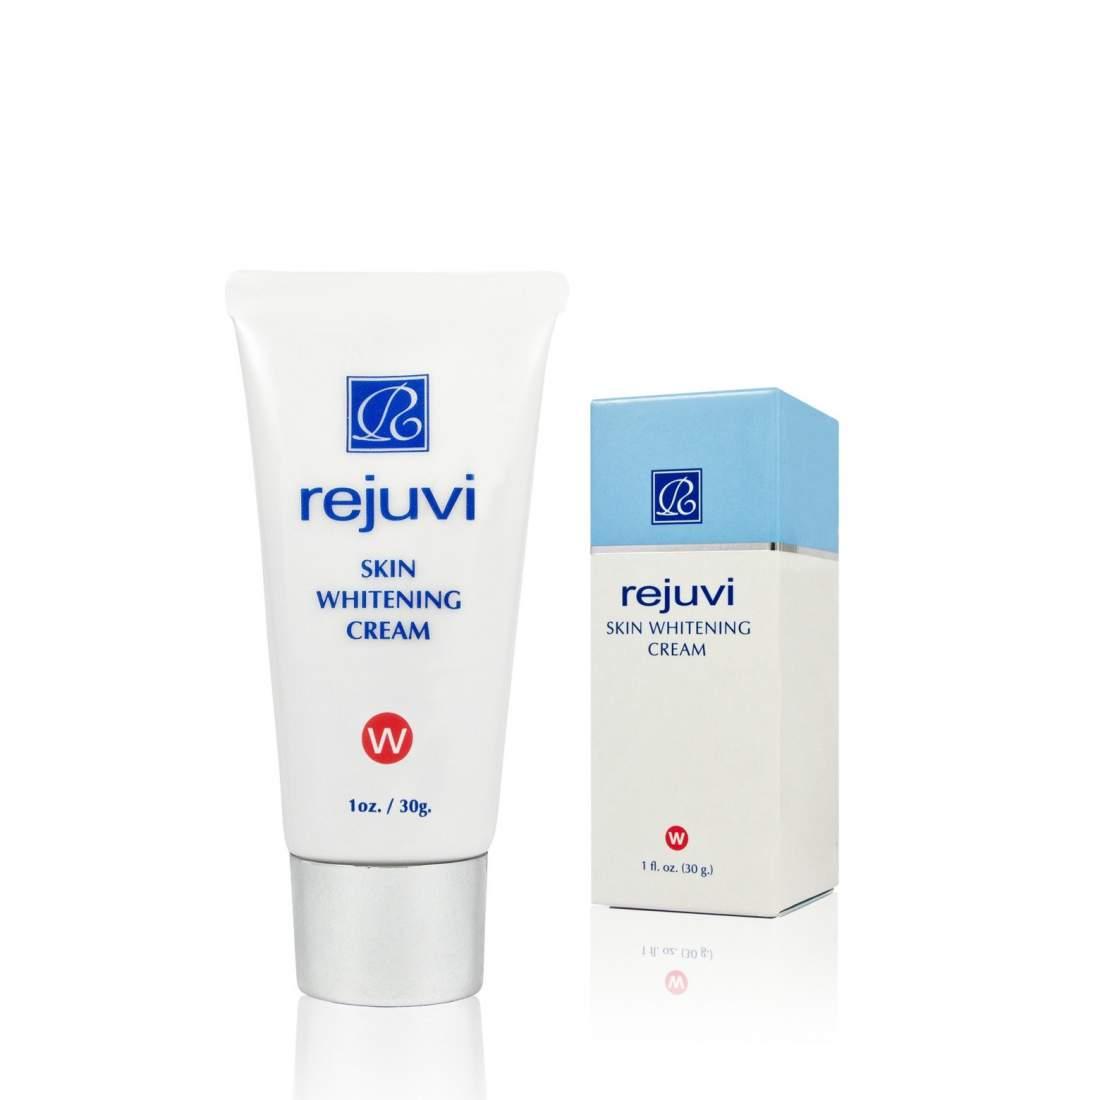 Világosítja, eltünteti, megelőzi a pigmentfoltokat - Skin Whitening Cream